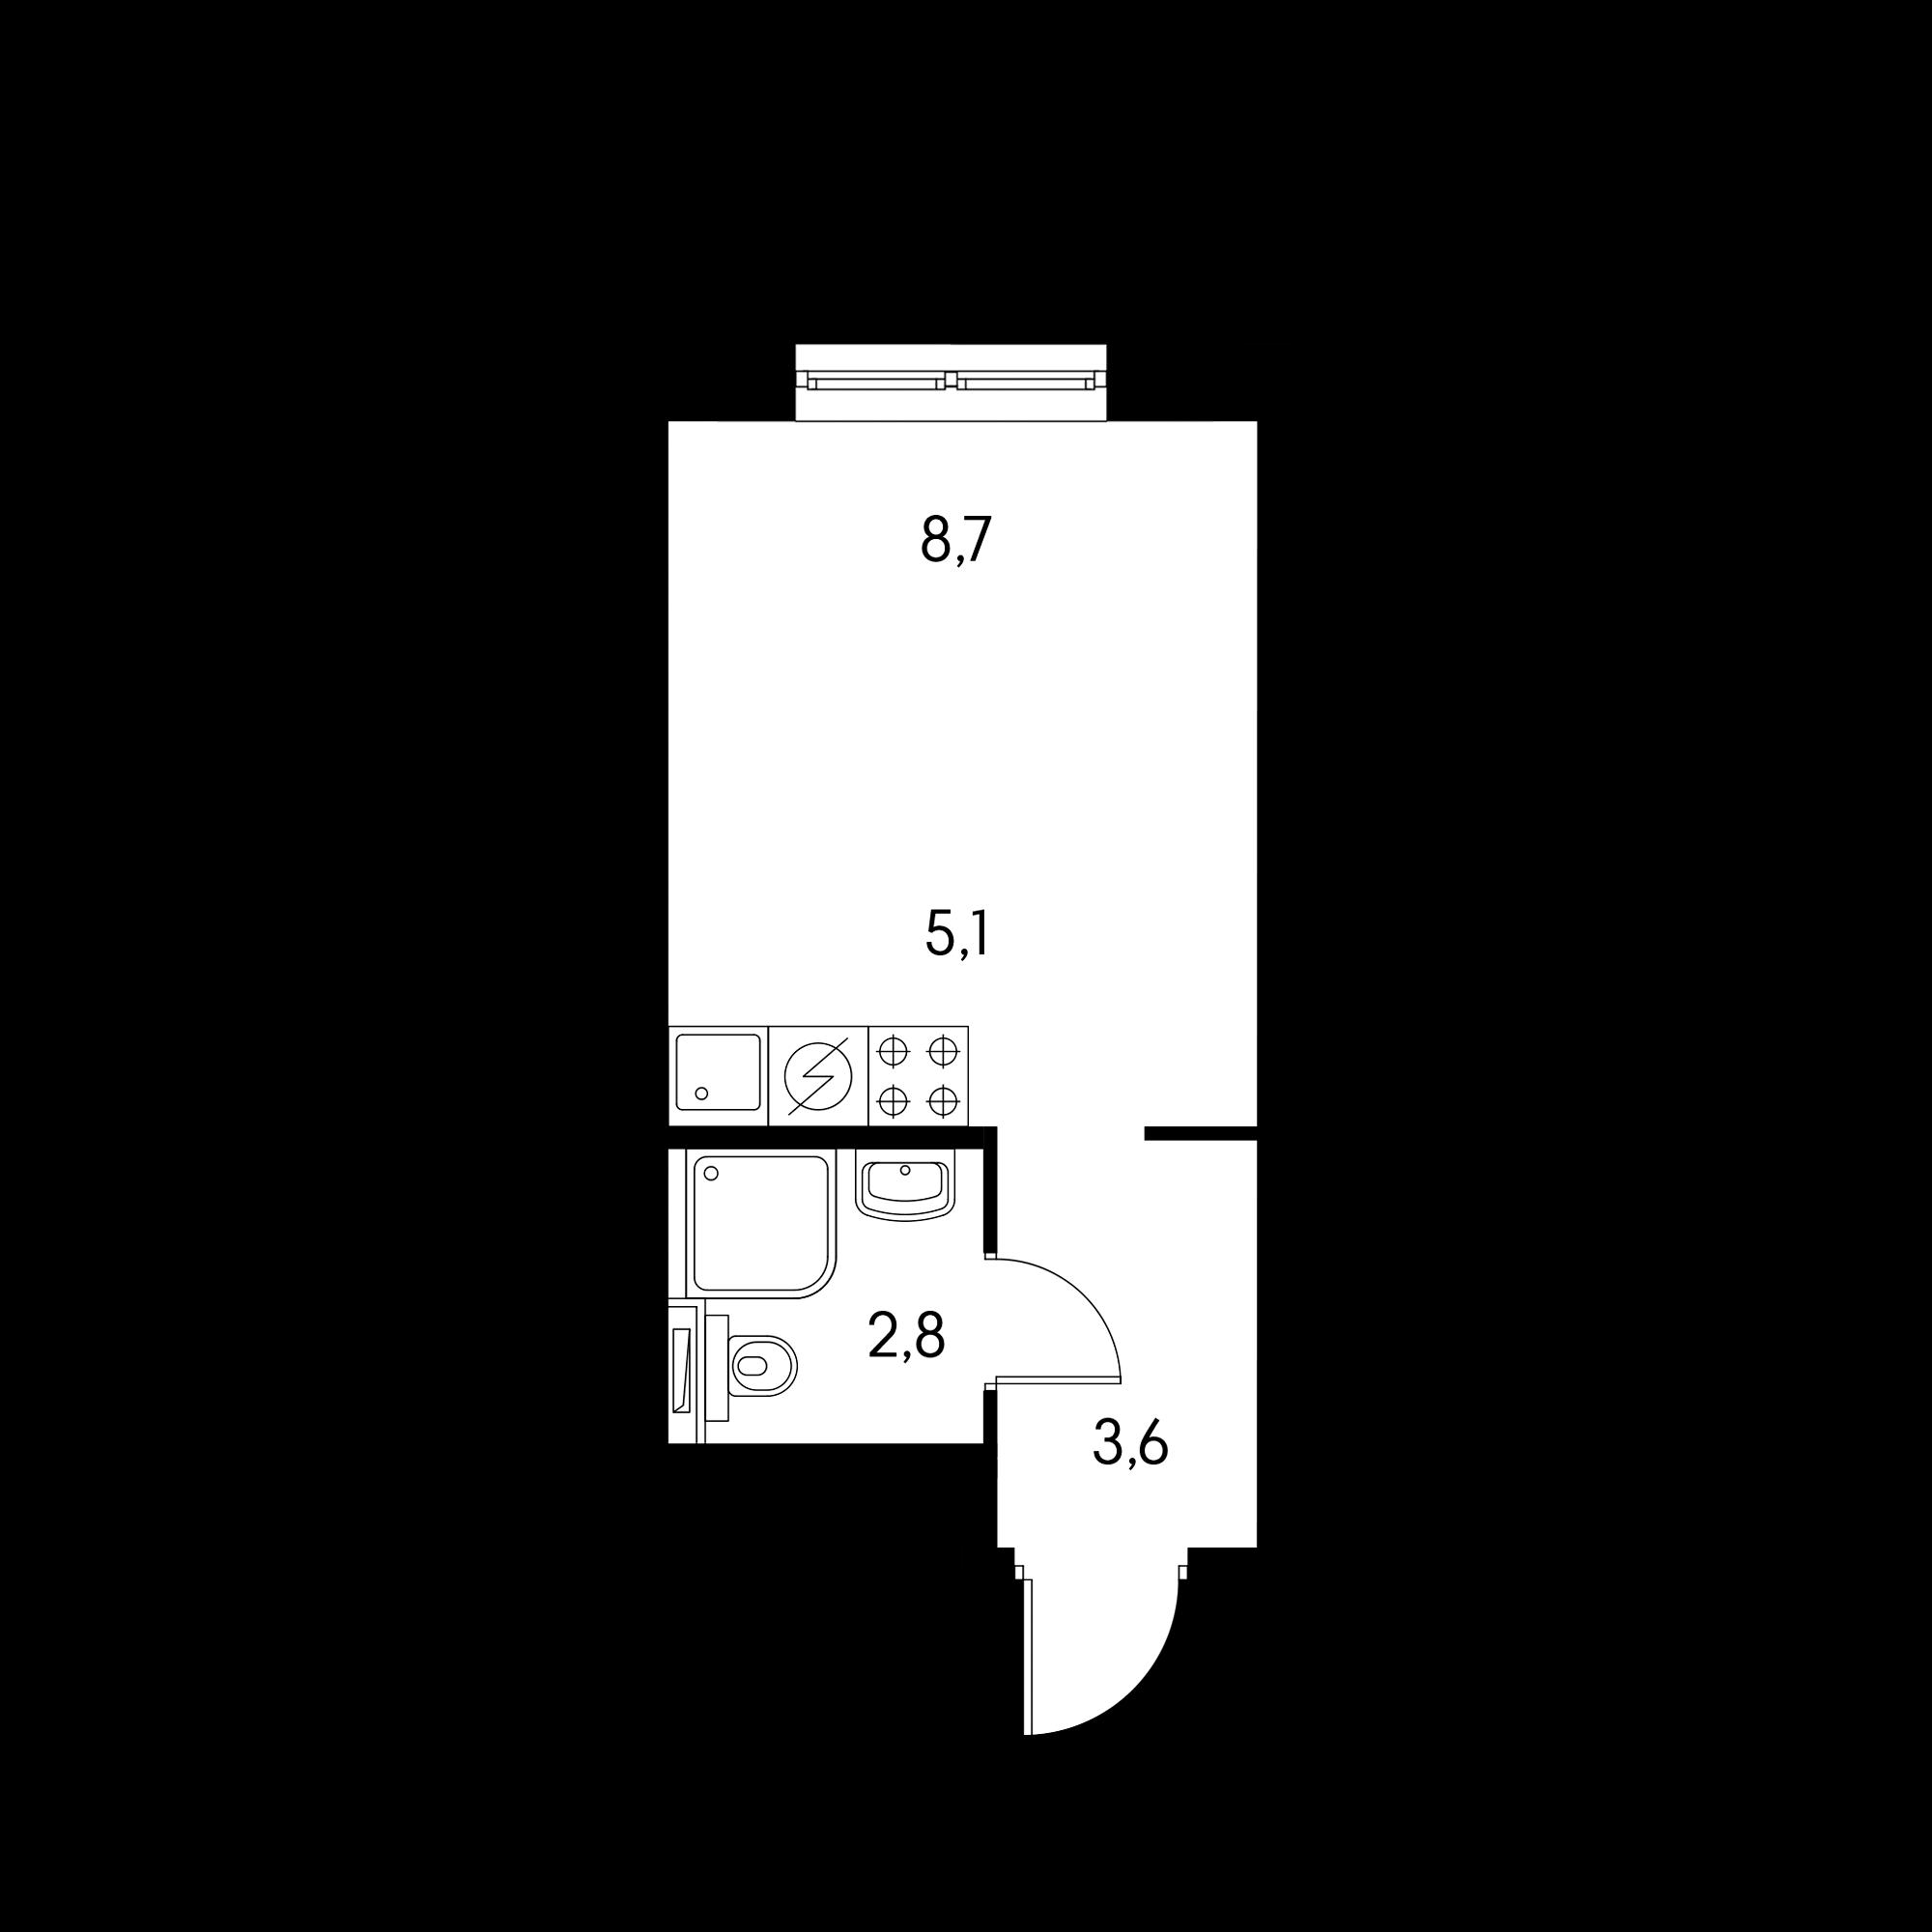 1NS1_1